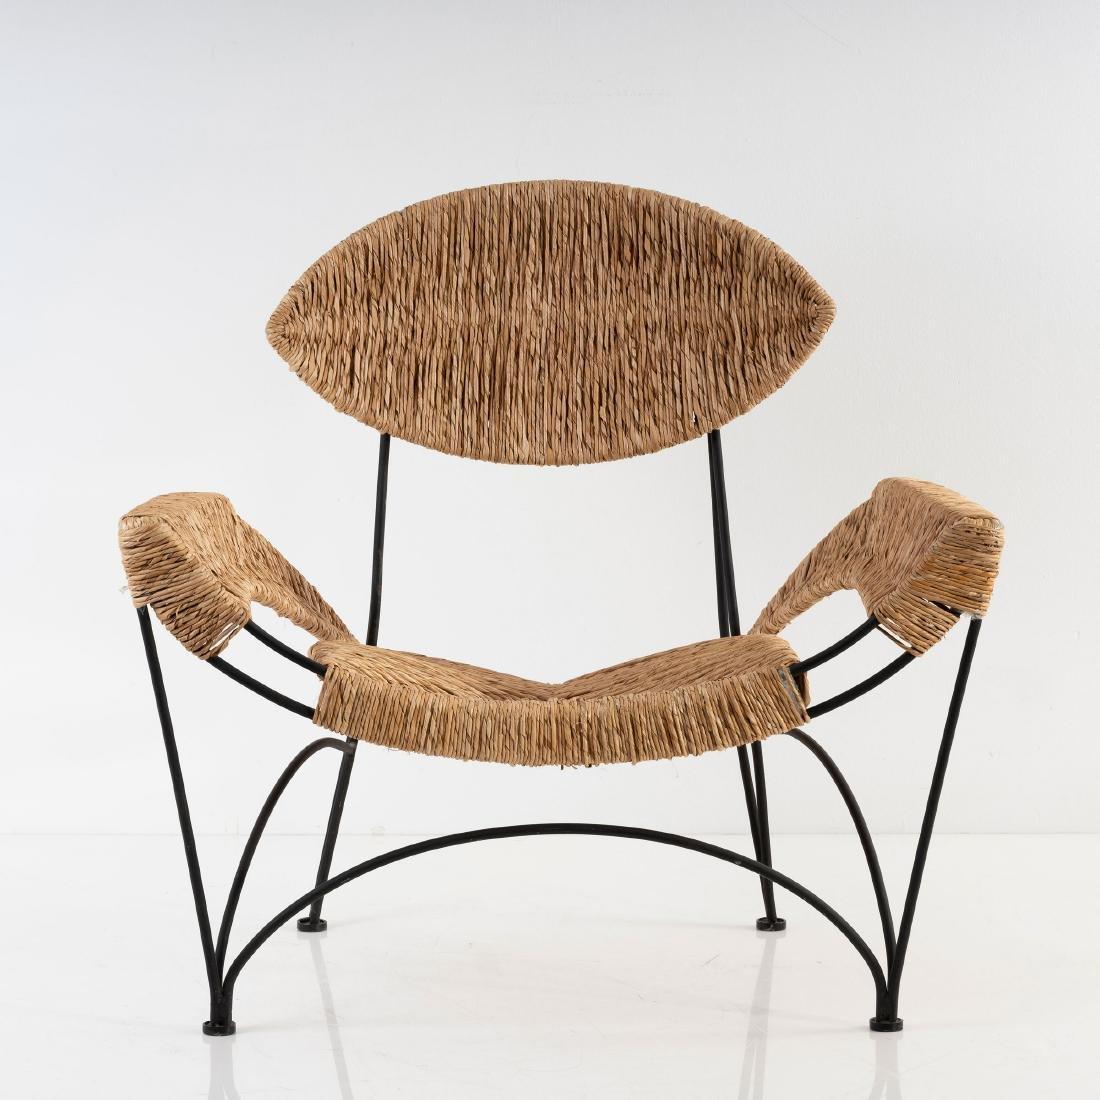 'Banana chair', 1988 - 2